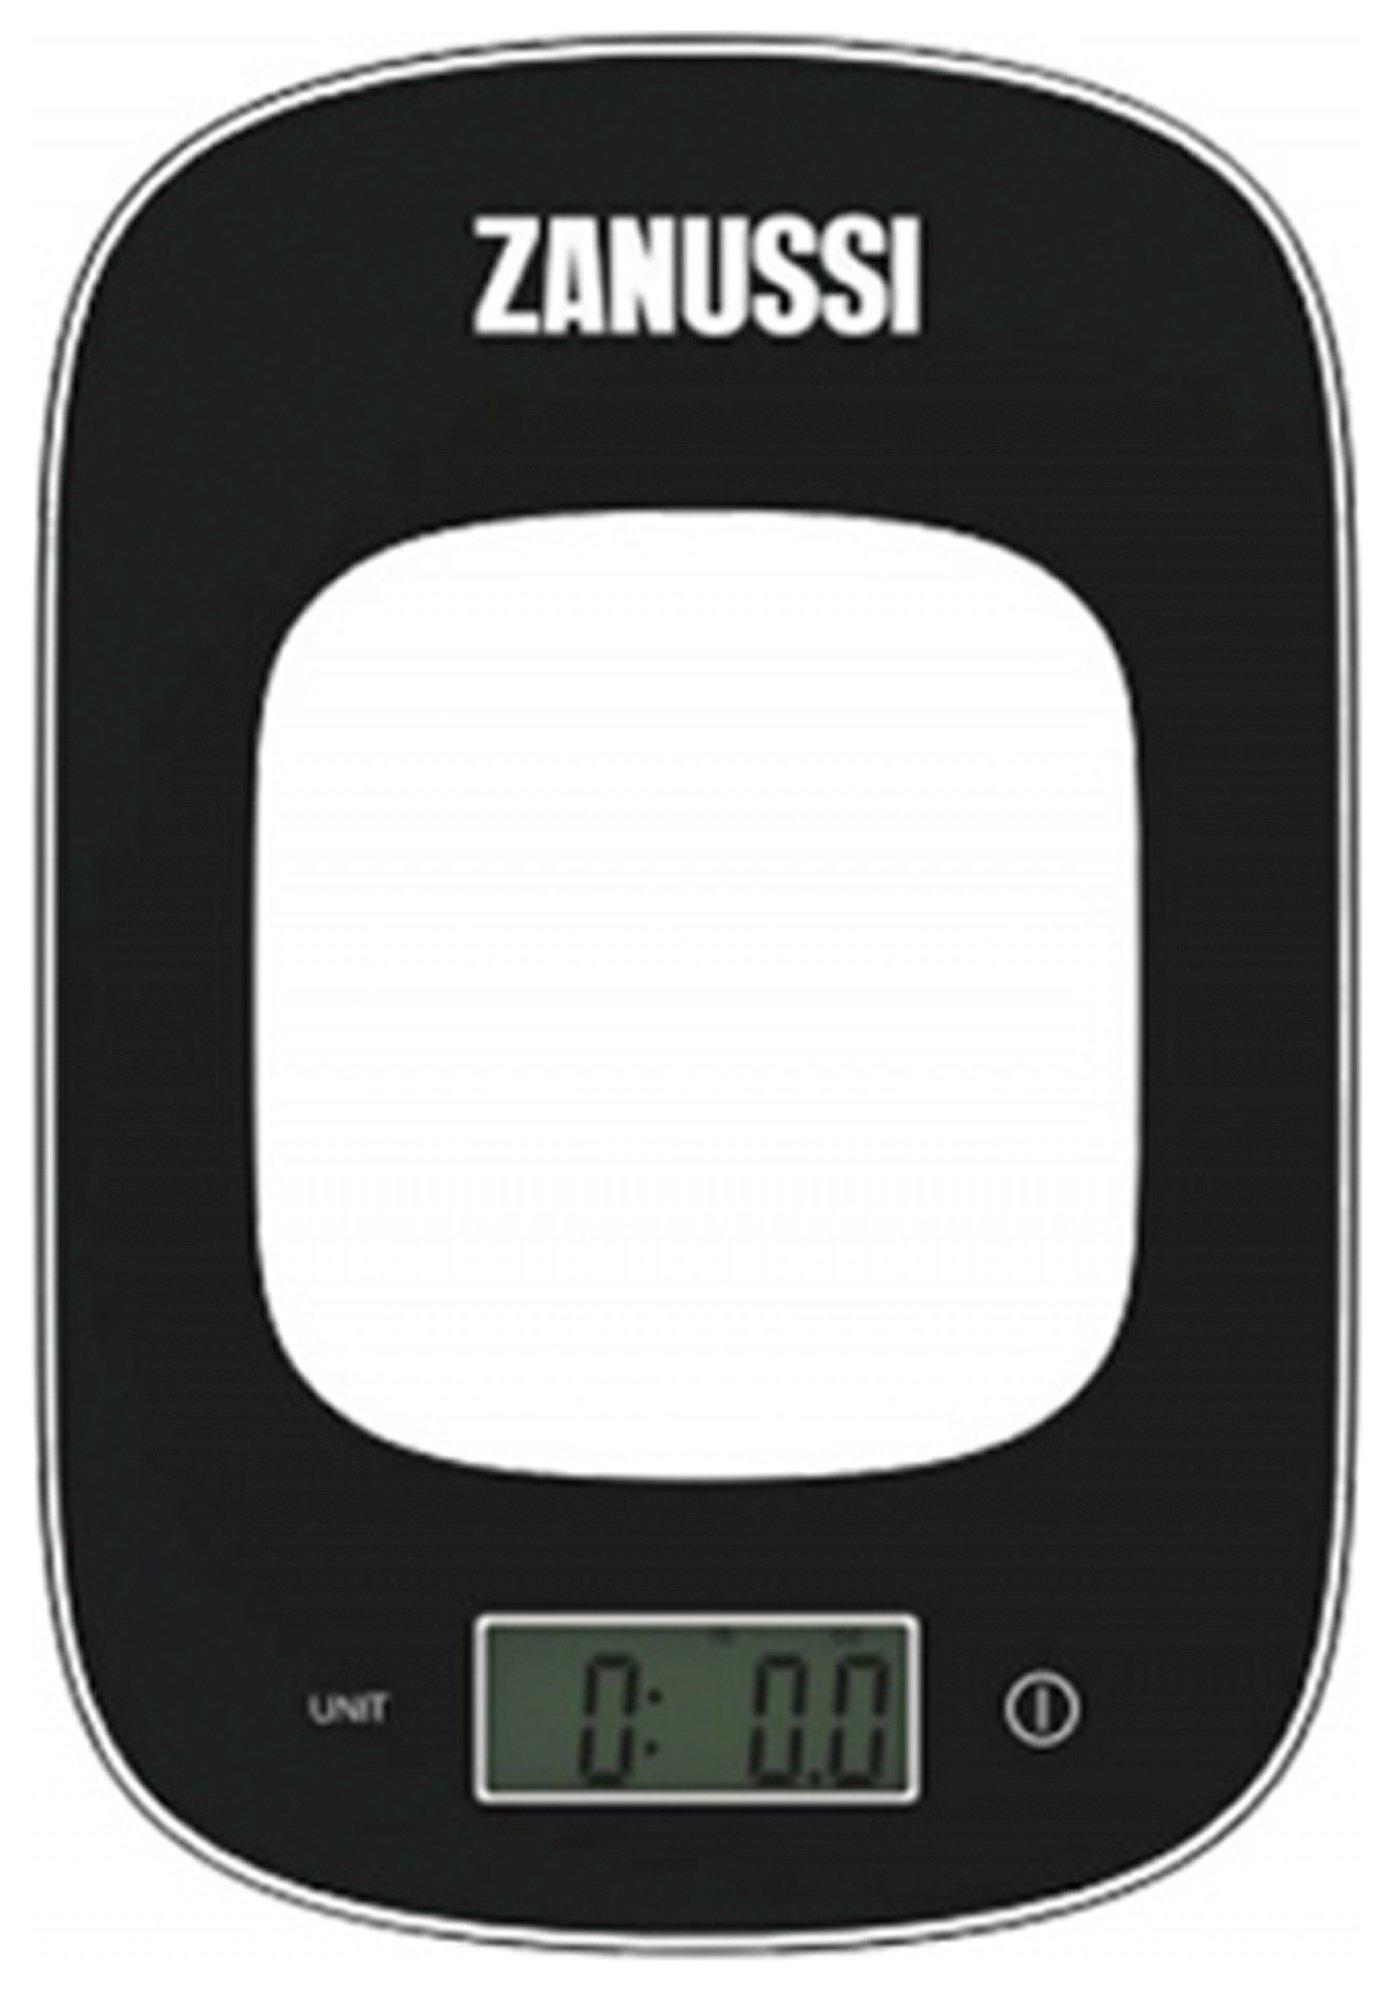 Zanussi Digital Kitchen Scales - Black